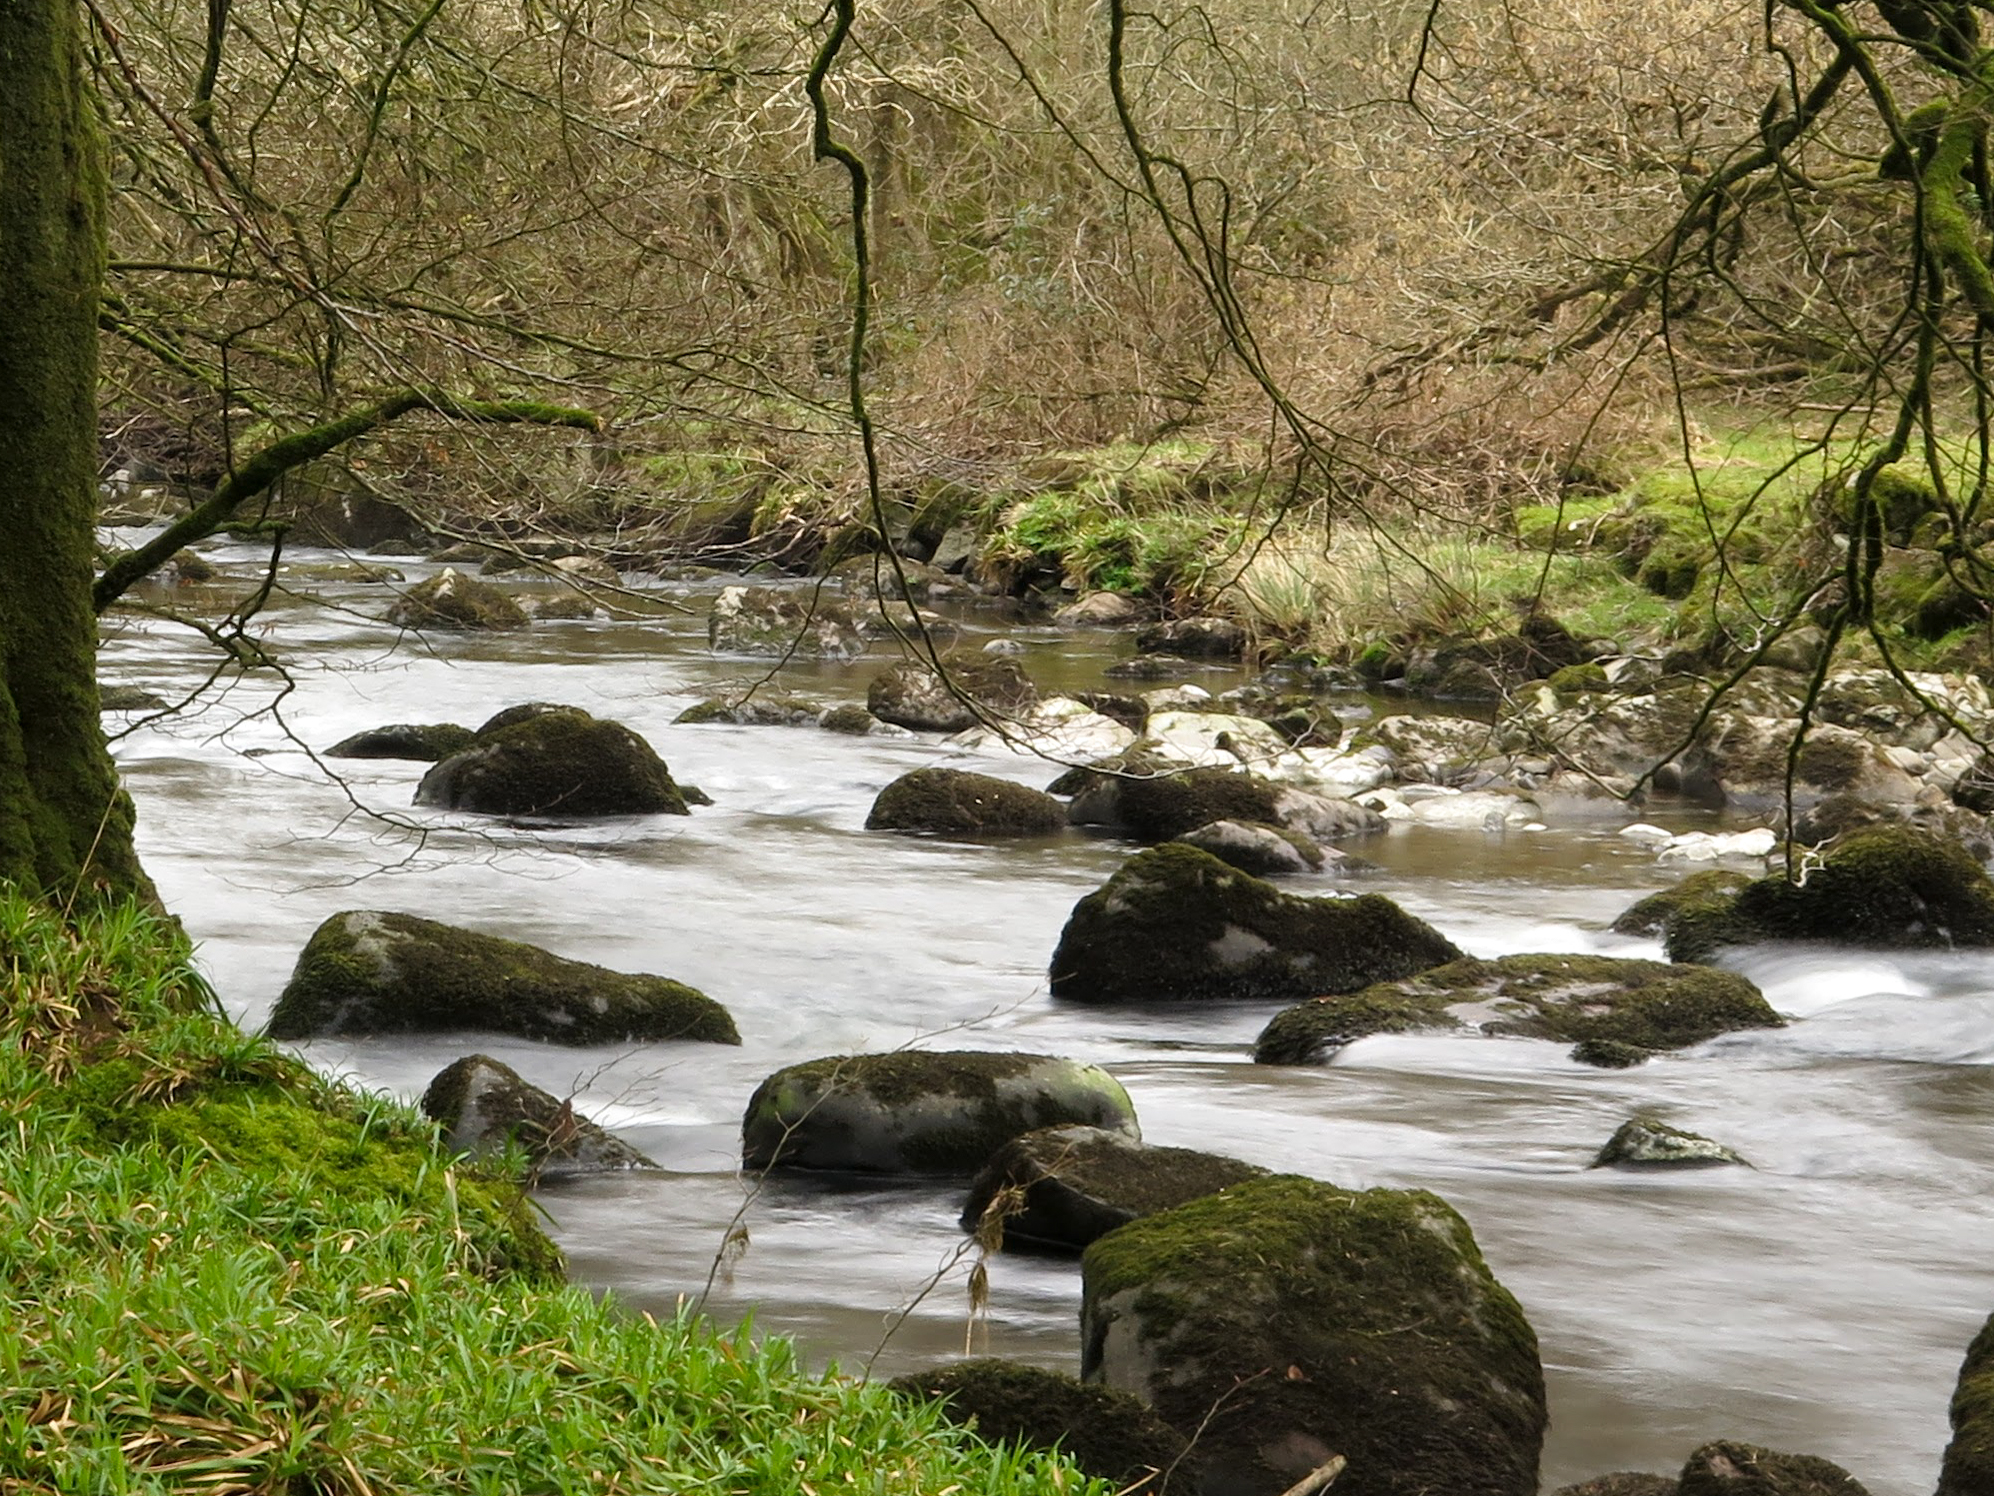 River habitat subject to otter and watervole surveys